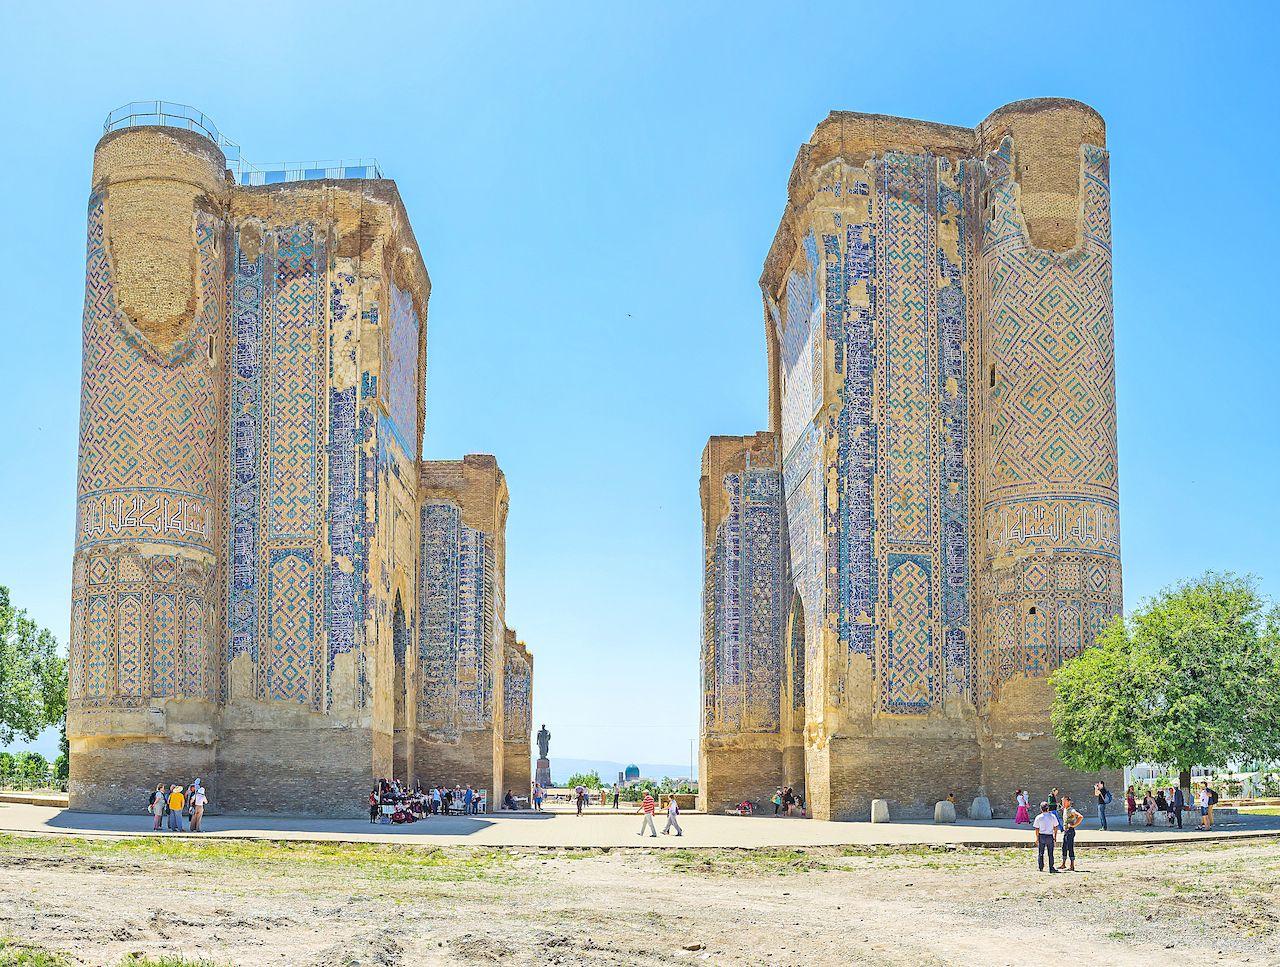 Ak-Saray Palace in uzbekistan